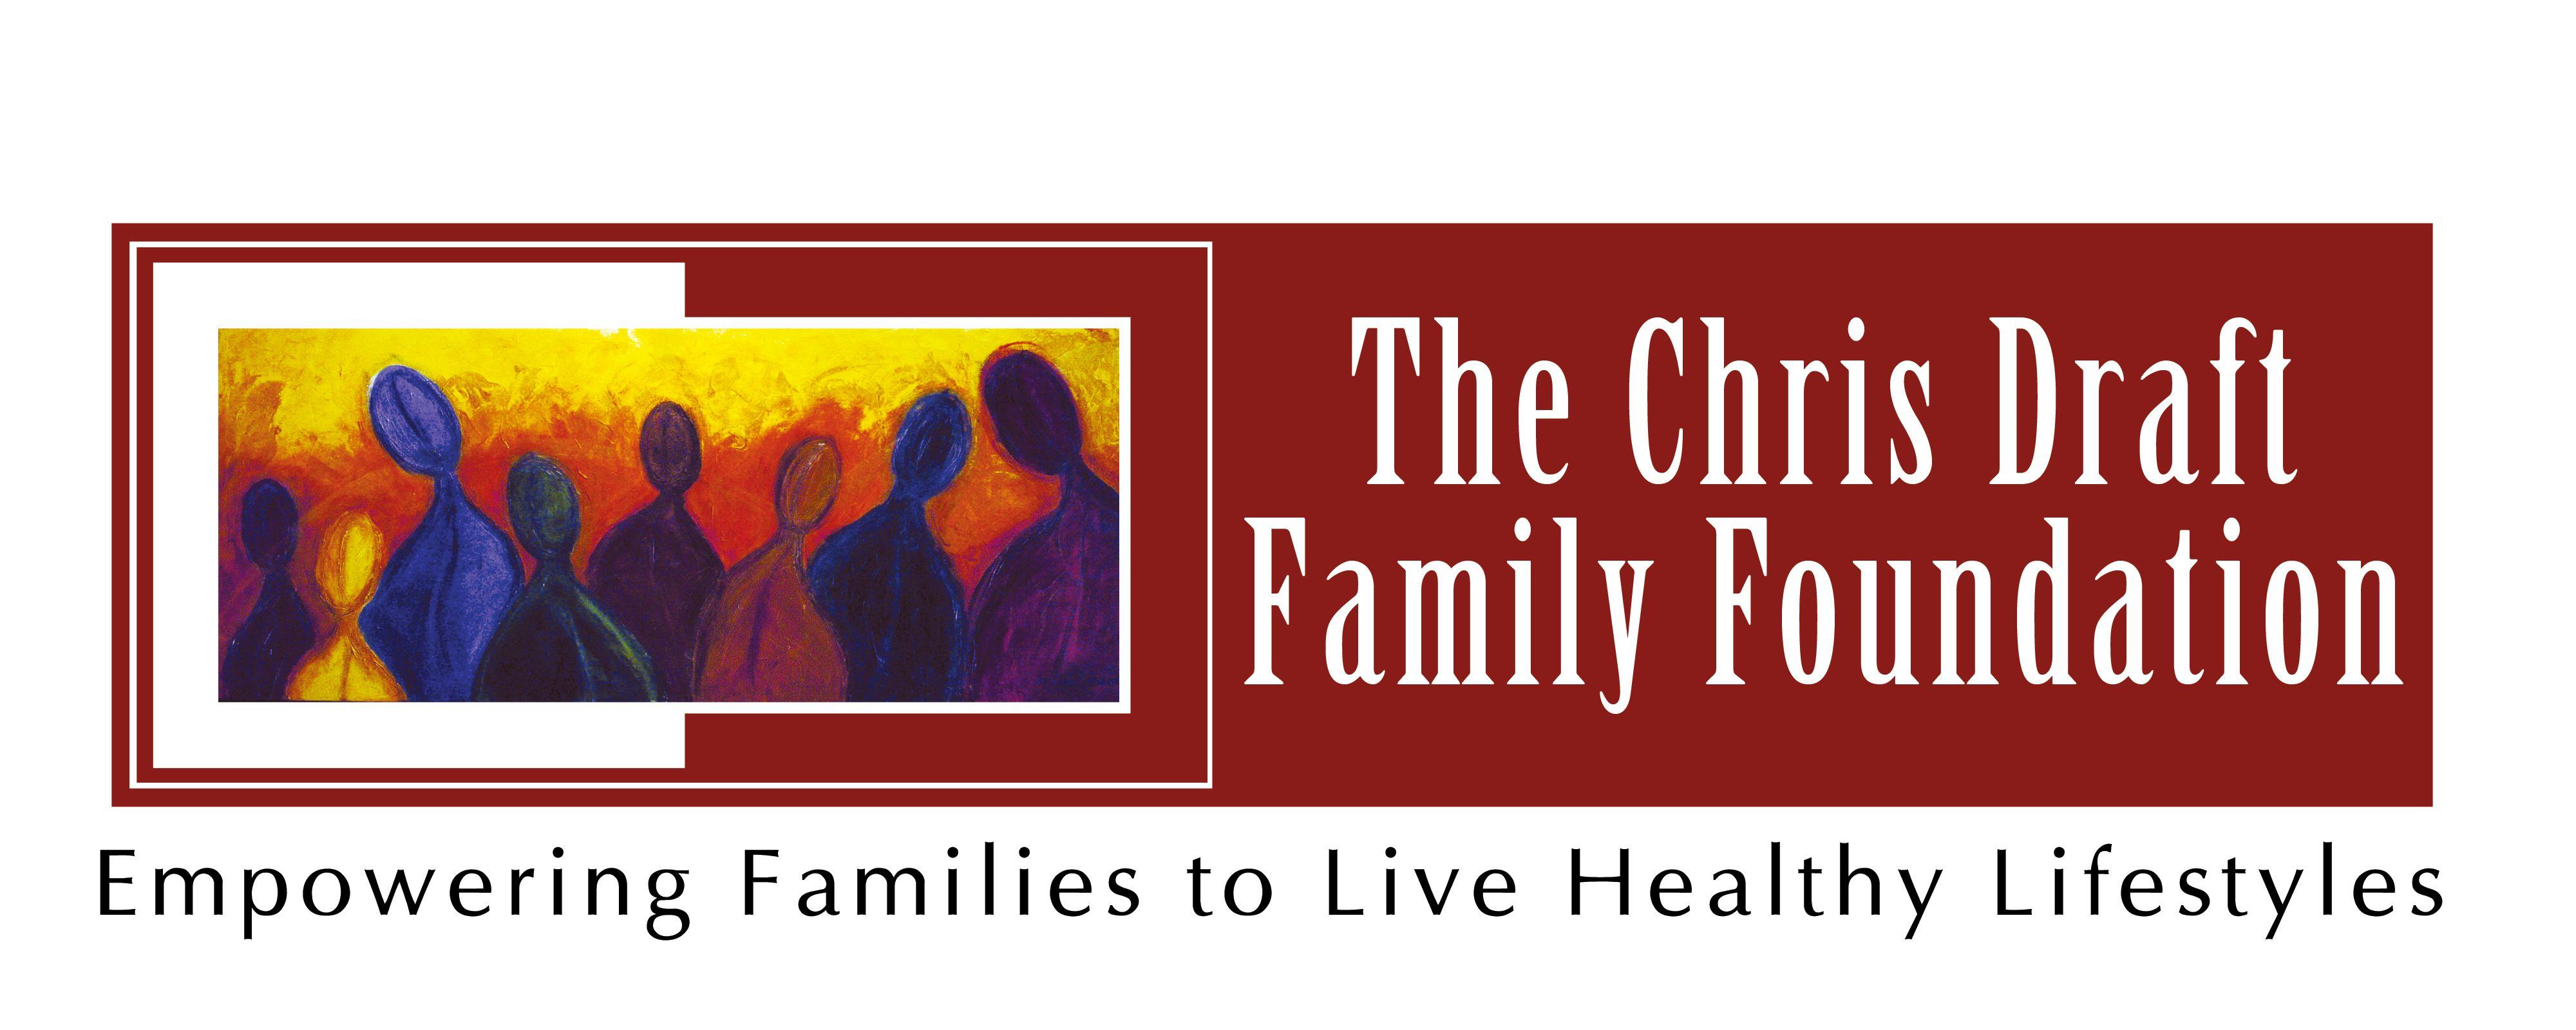 Advocacy Groups | <b>Chris Draft Family Foundation</b>